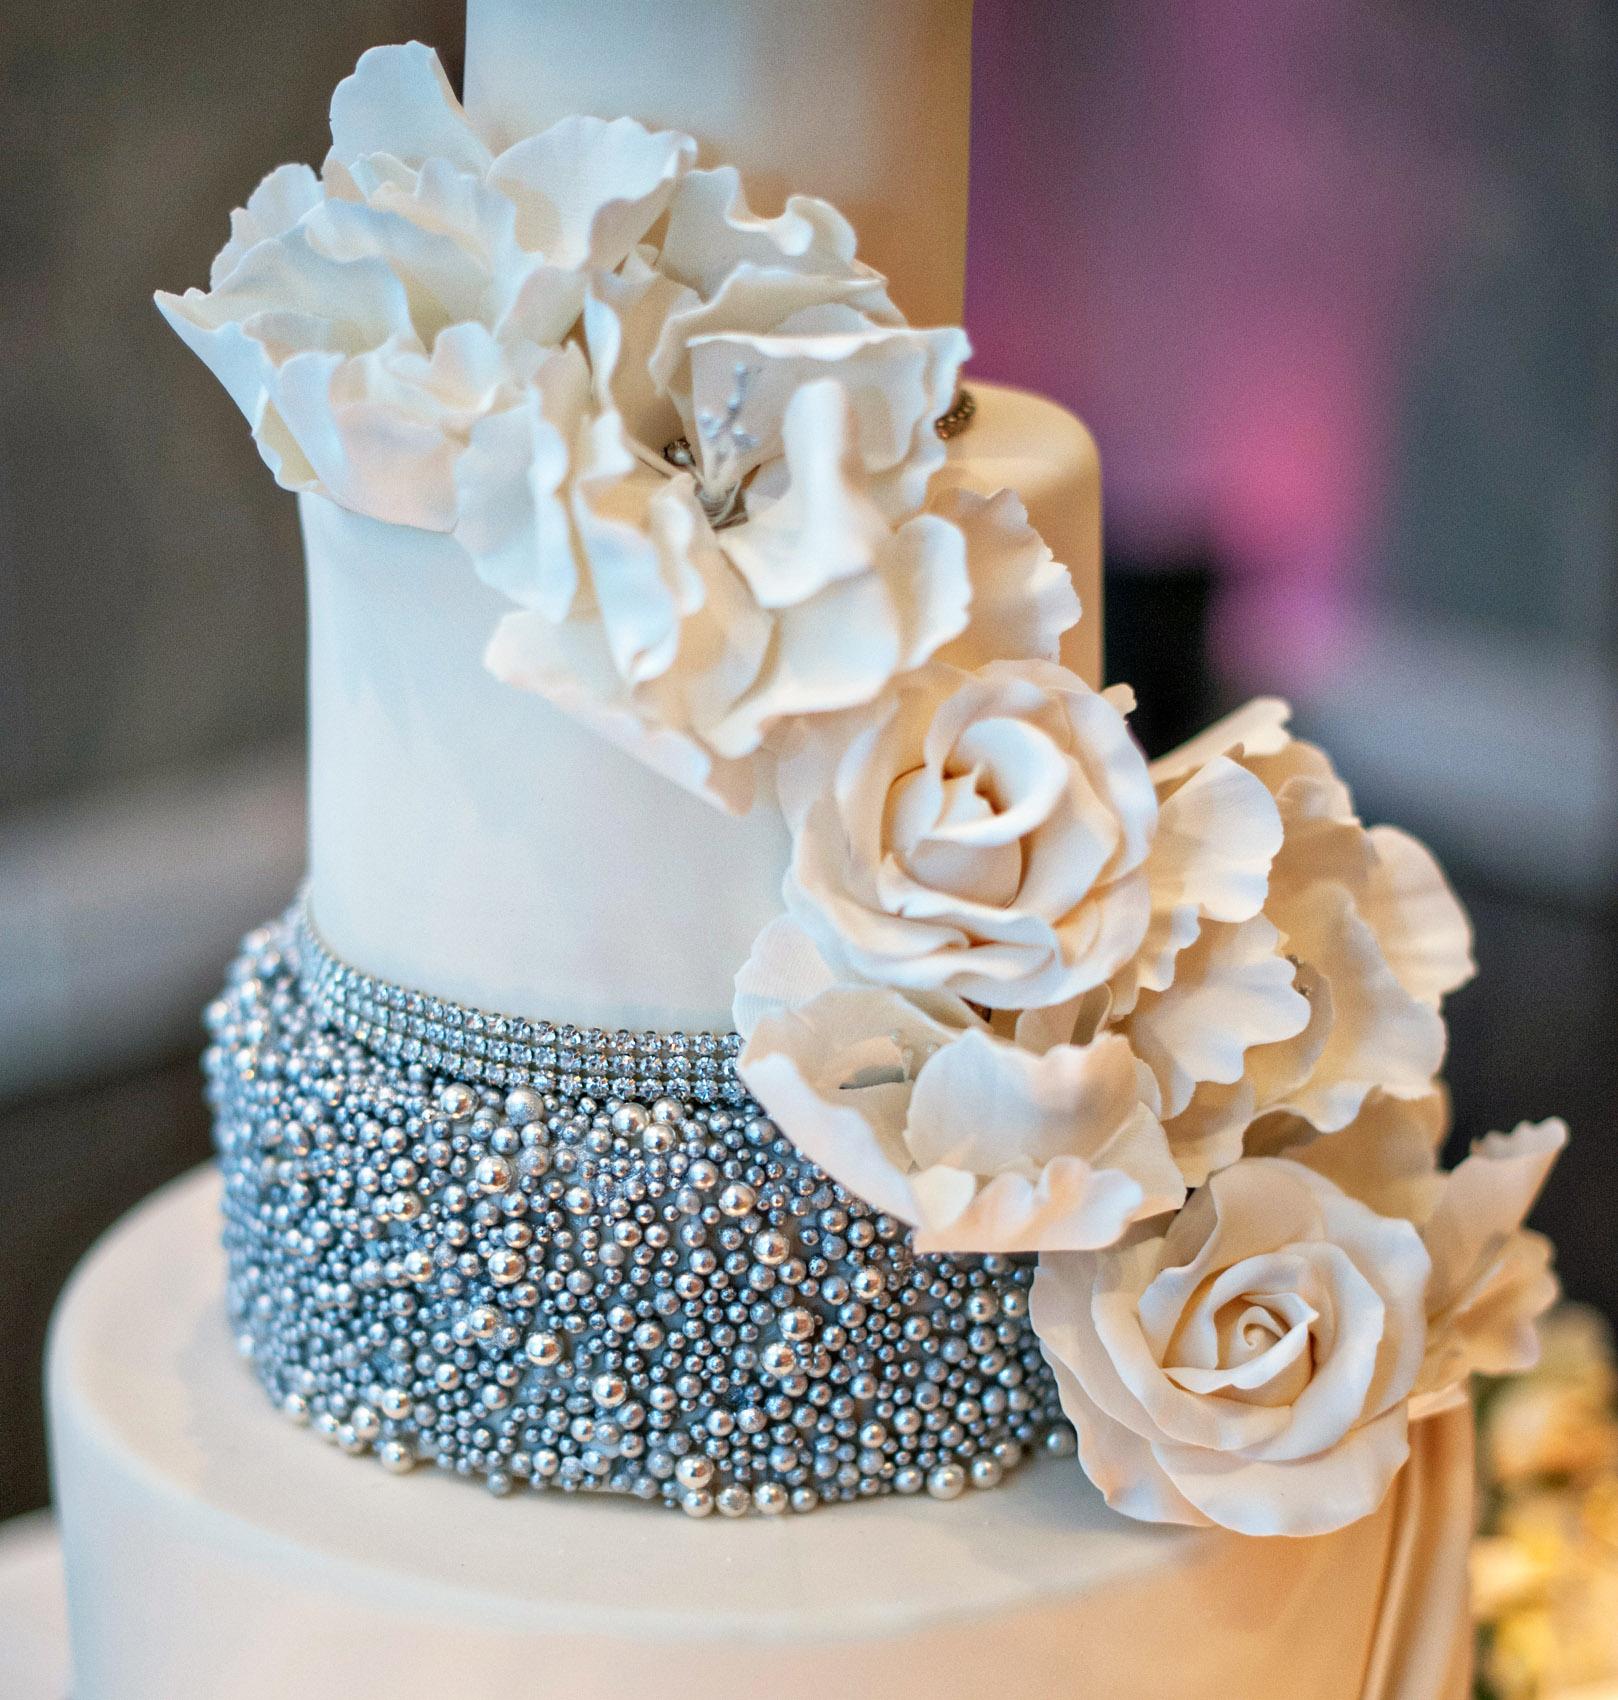 069Hotel Bel Air Wedding Joy Marie.jpg